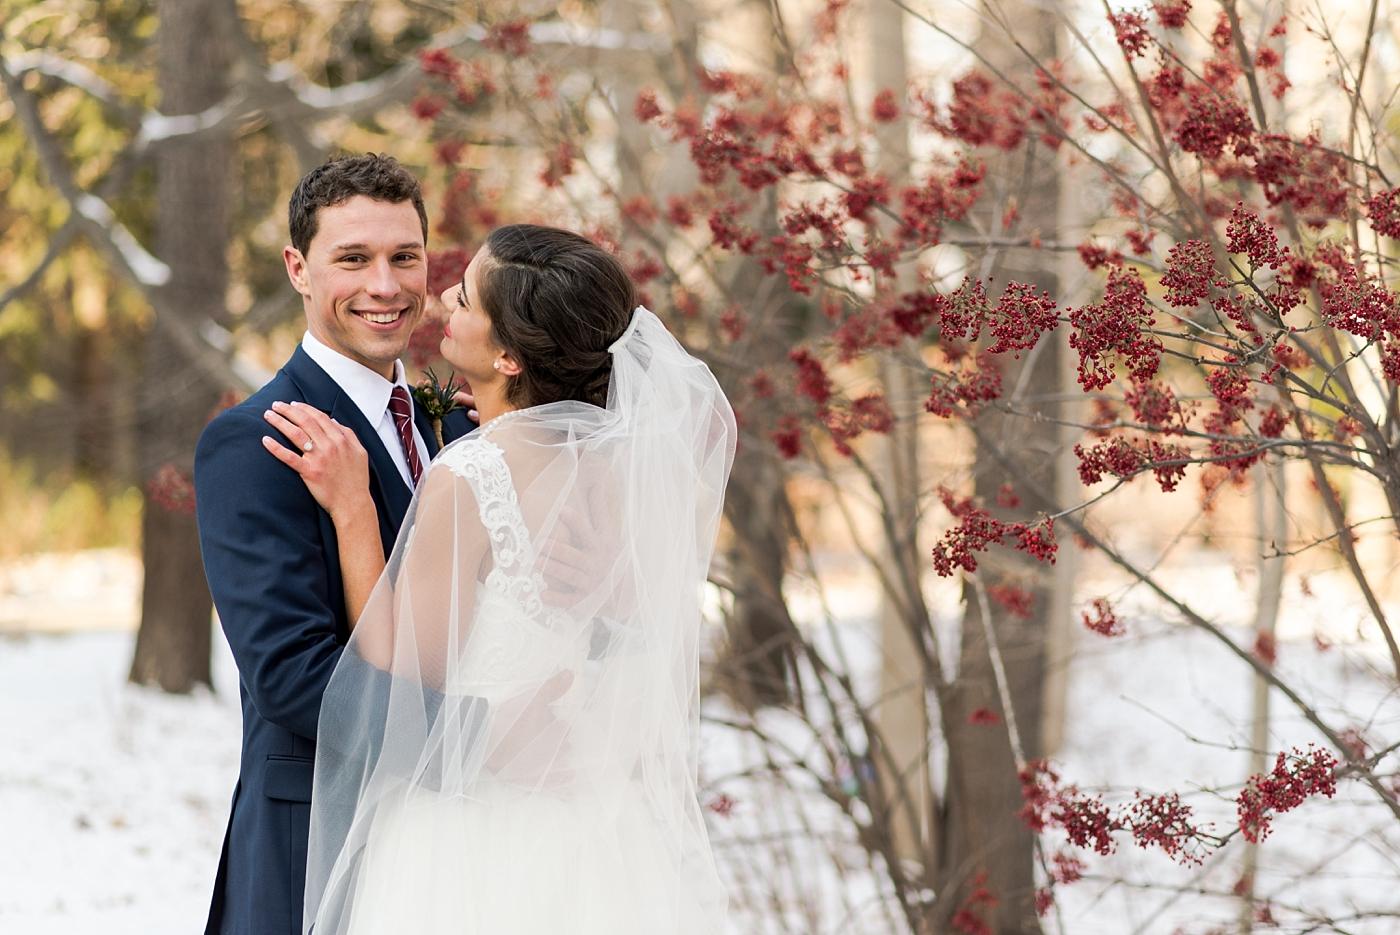 indianapolis-top-rated-wedding-photographers_0443.jpg